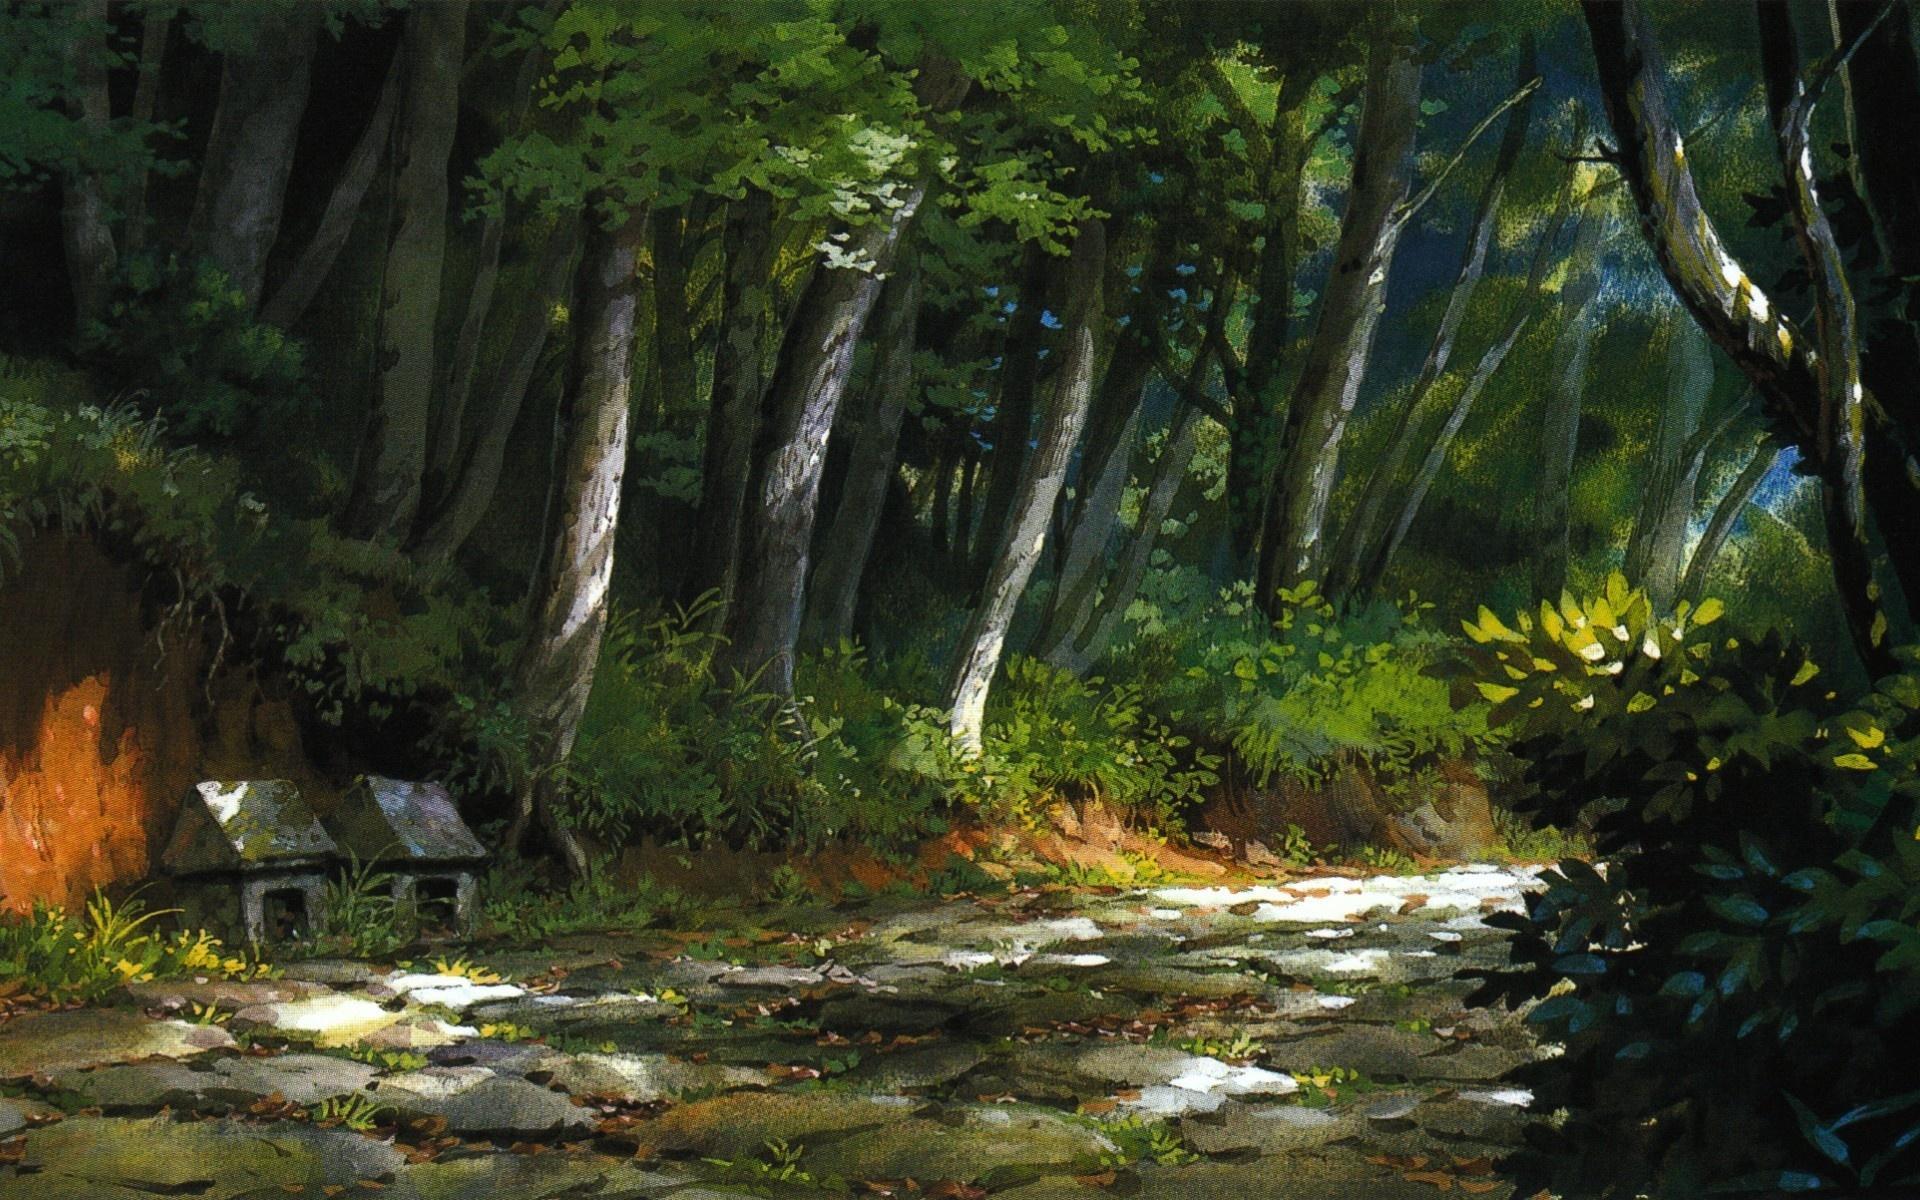 Дорога, картина, лес, трава, тропа обои ...: hq-wallpapers.ru/wallpapers/nature/pic60962_raz1920x1200